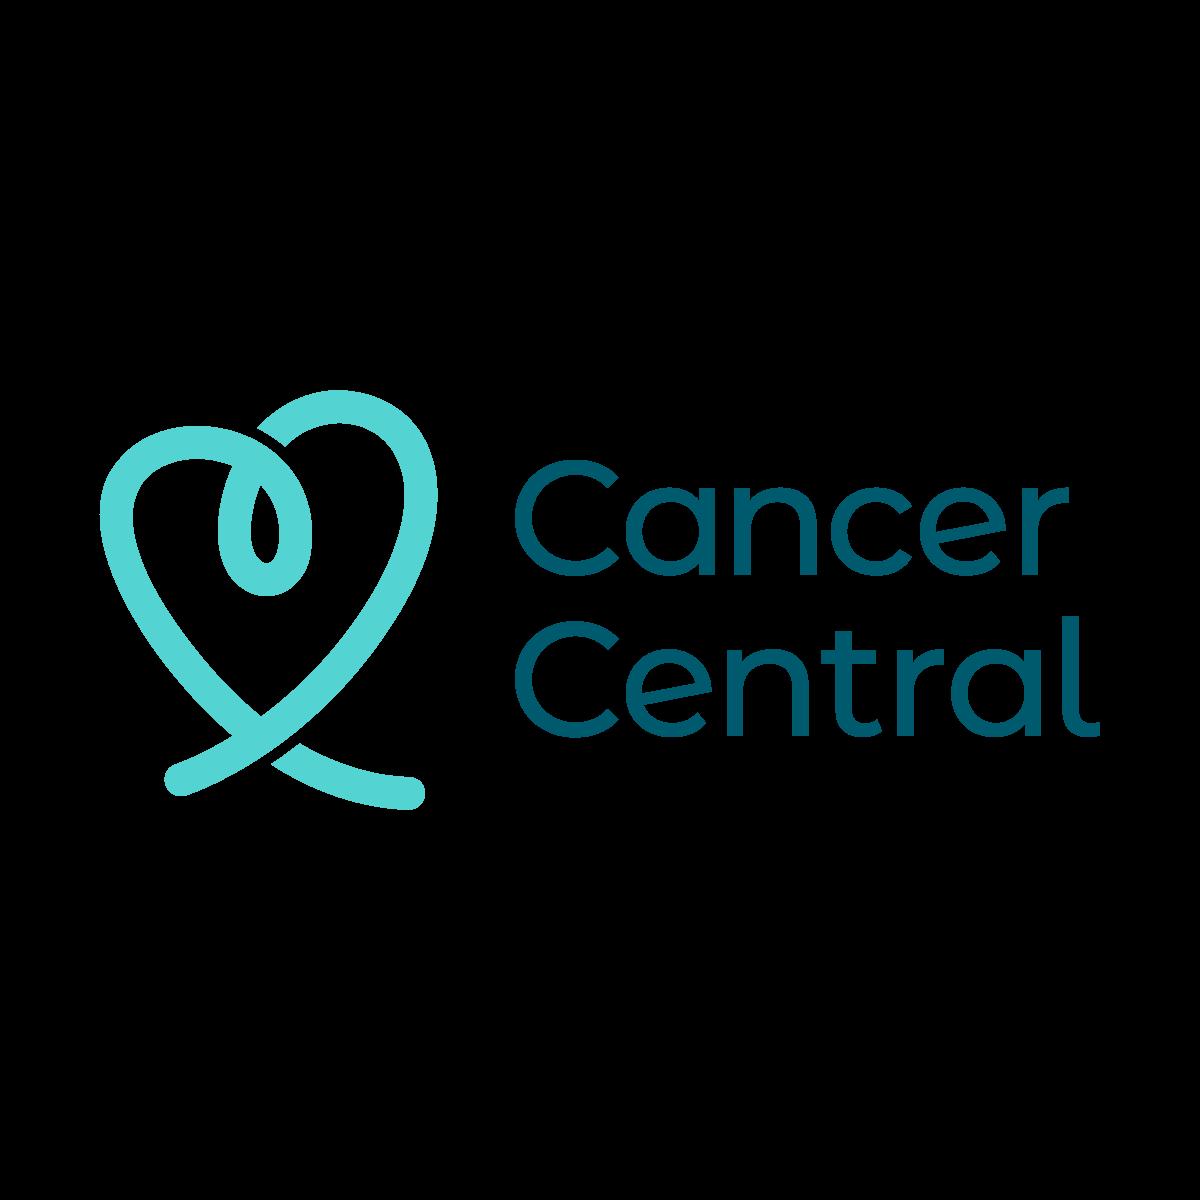 Cancer Central logo